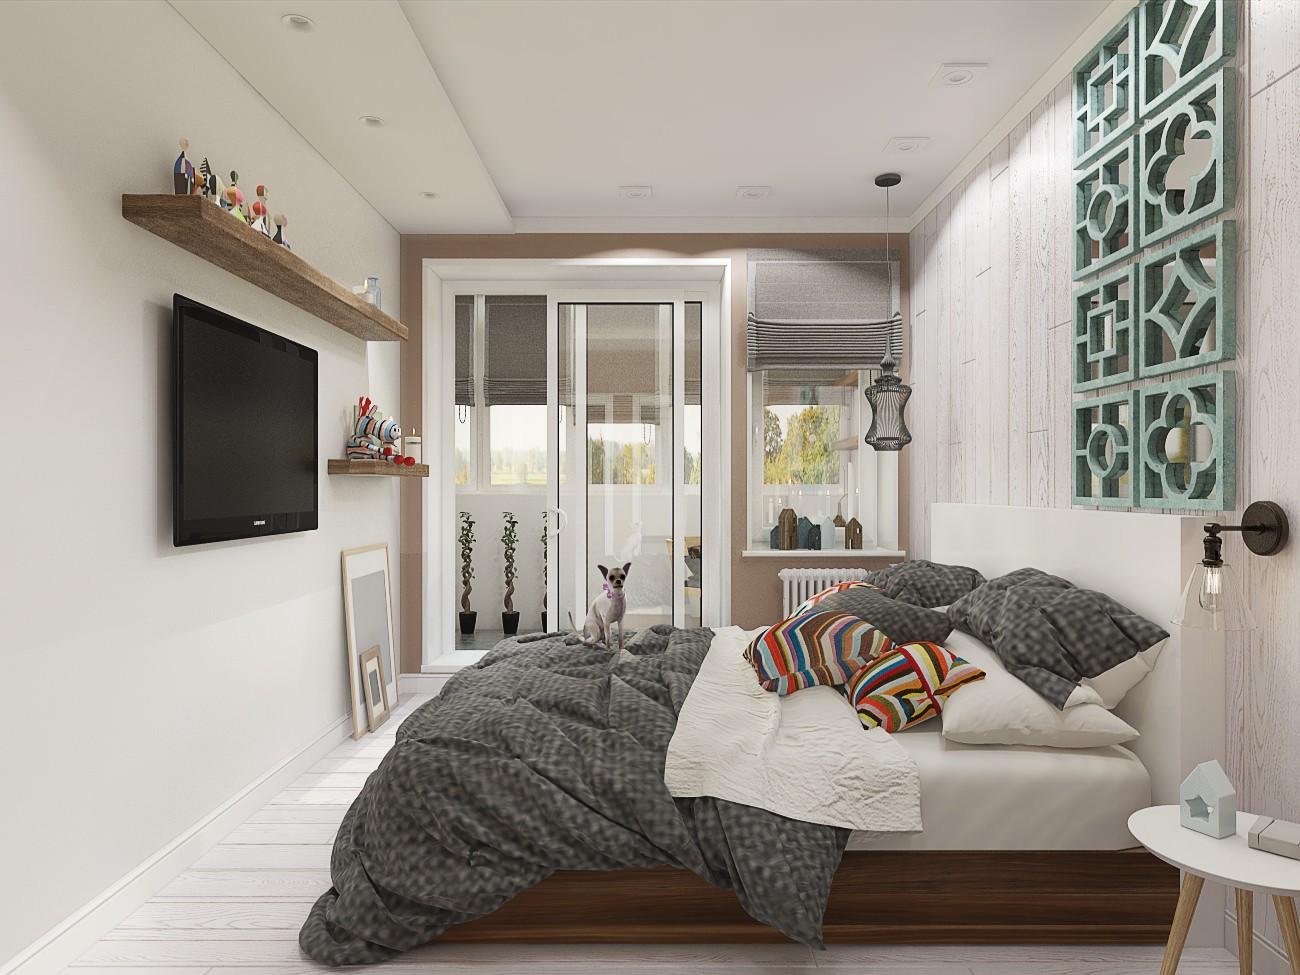 спальня 8 кв м интерьер идеи